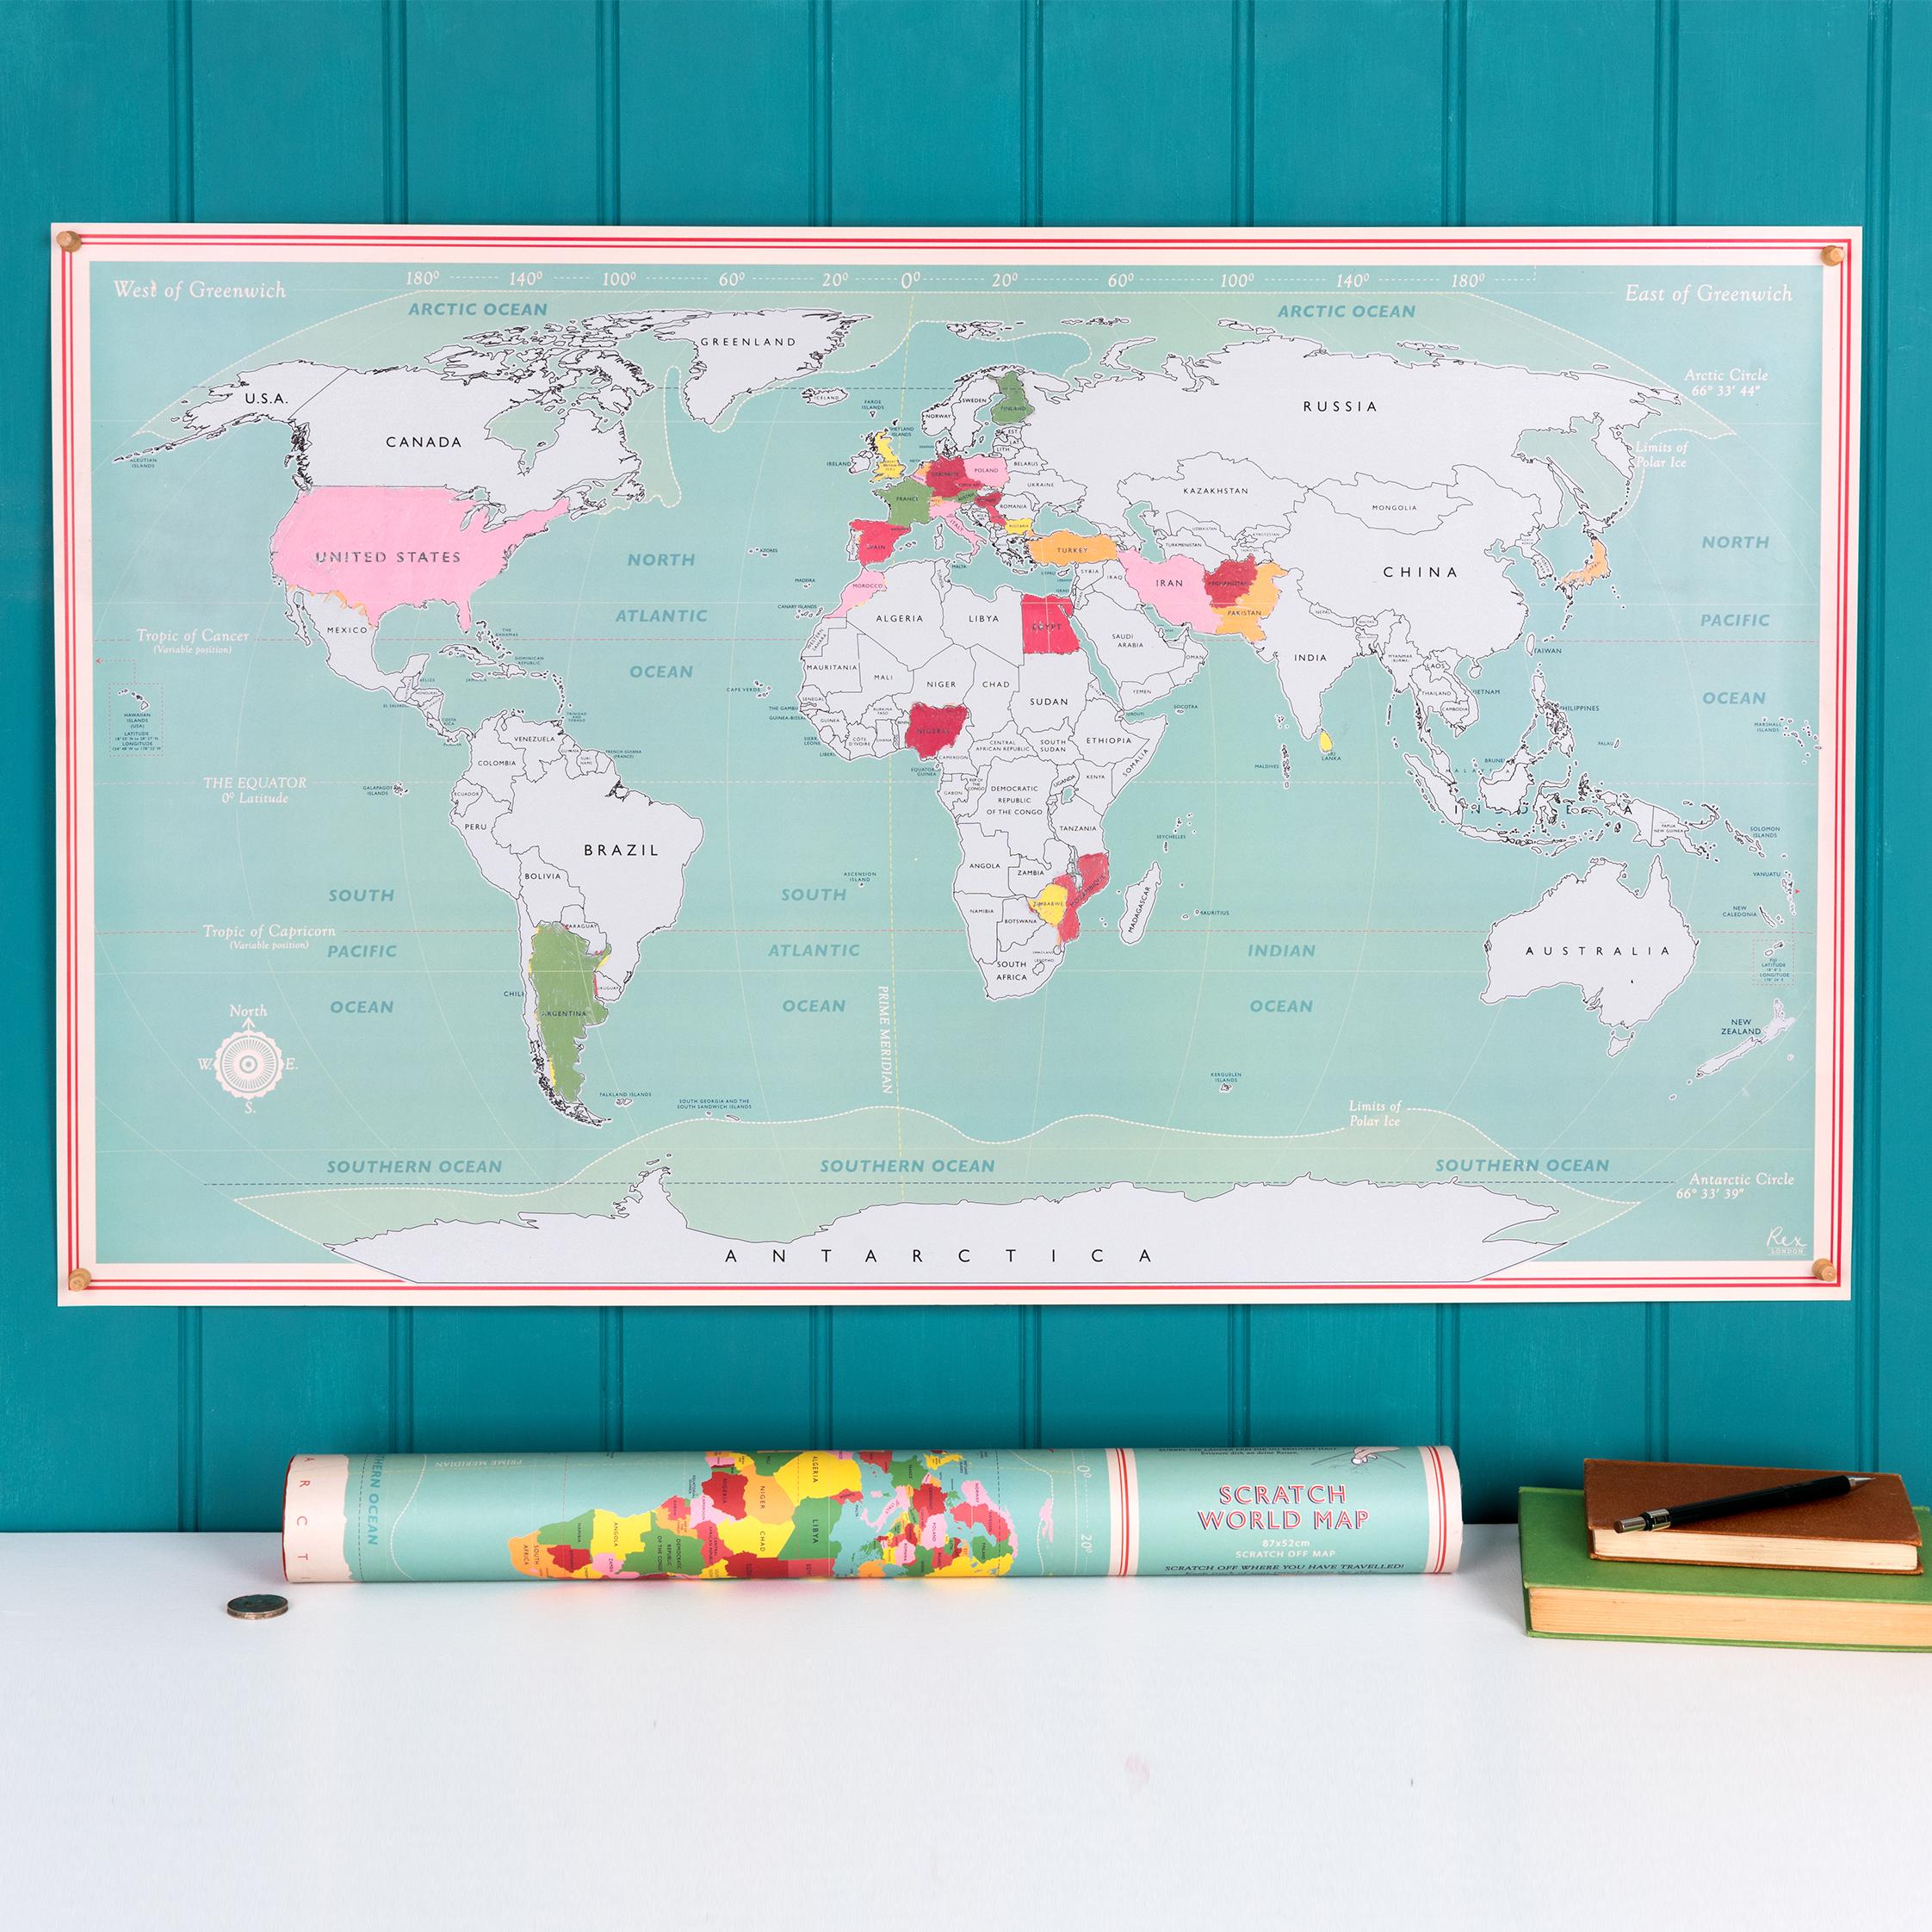 Scratch World Map Rex London Dotcomgiftshop